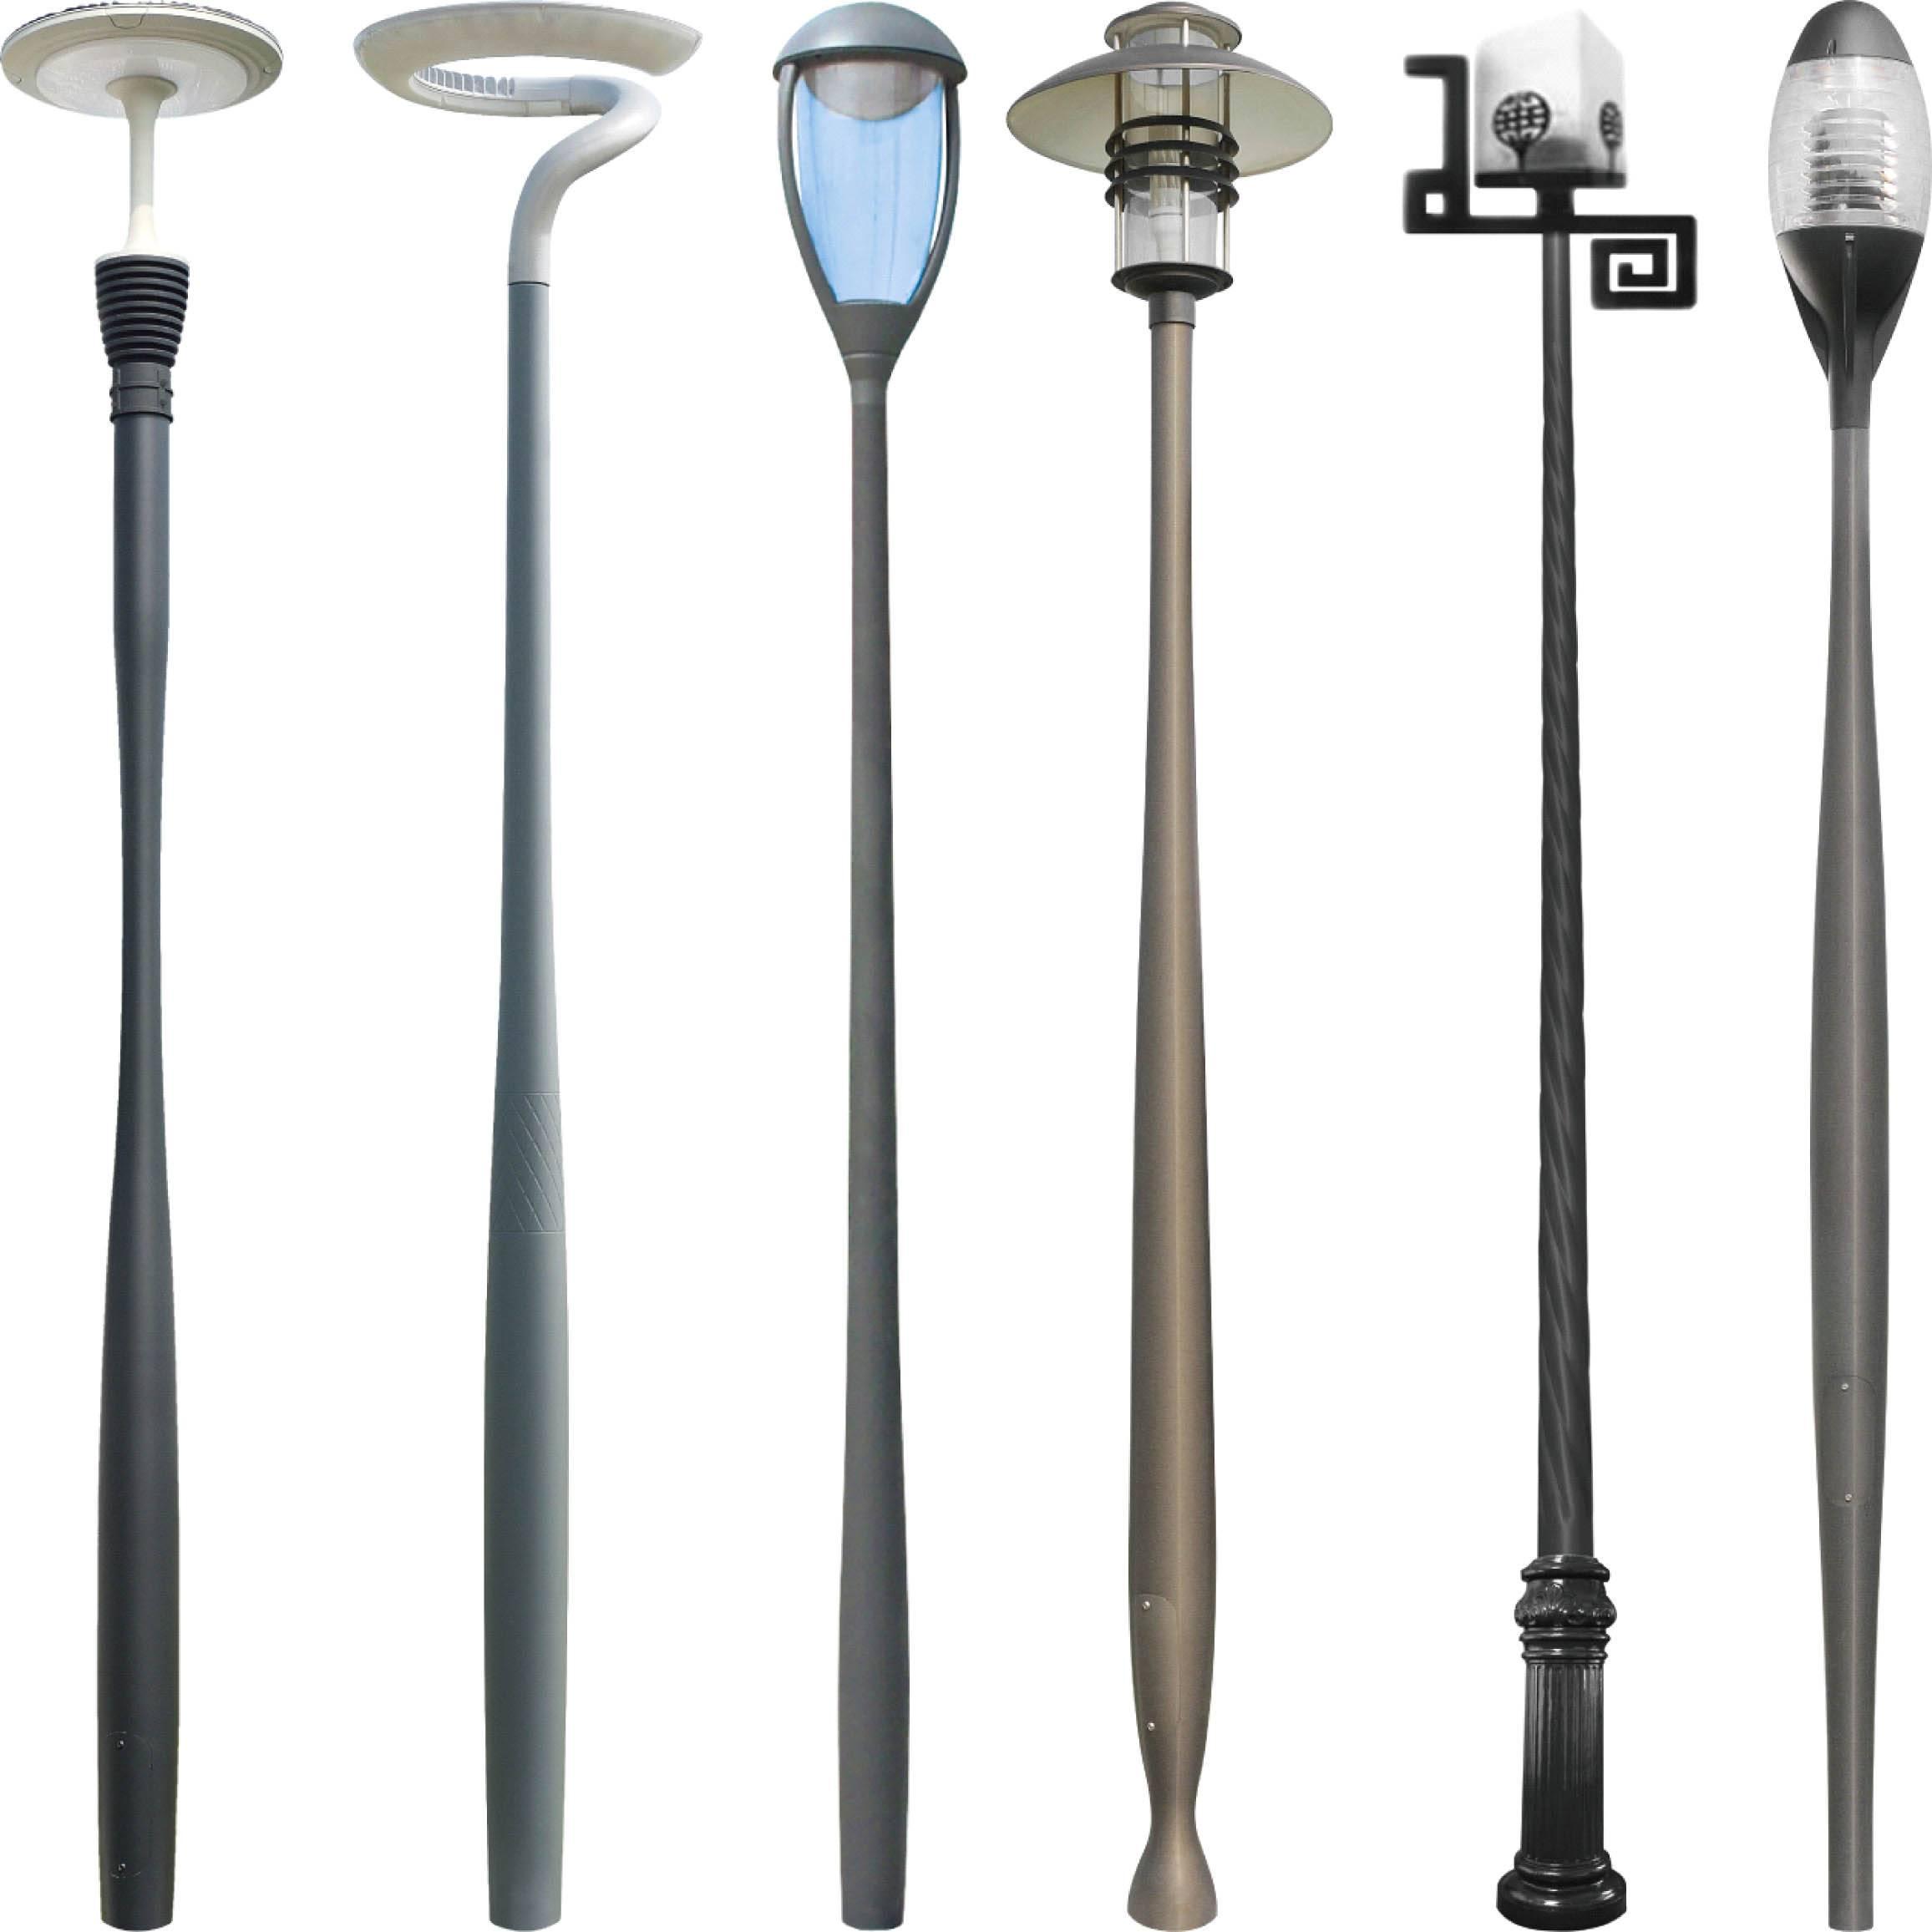 lamp poles, light poles, light posts